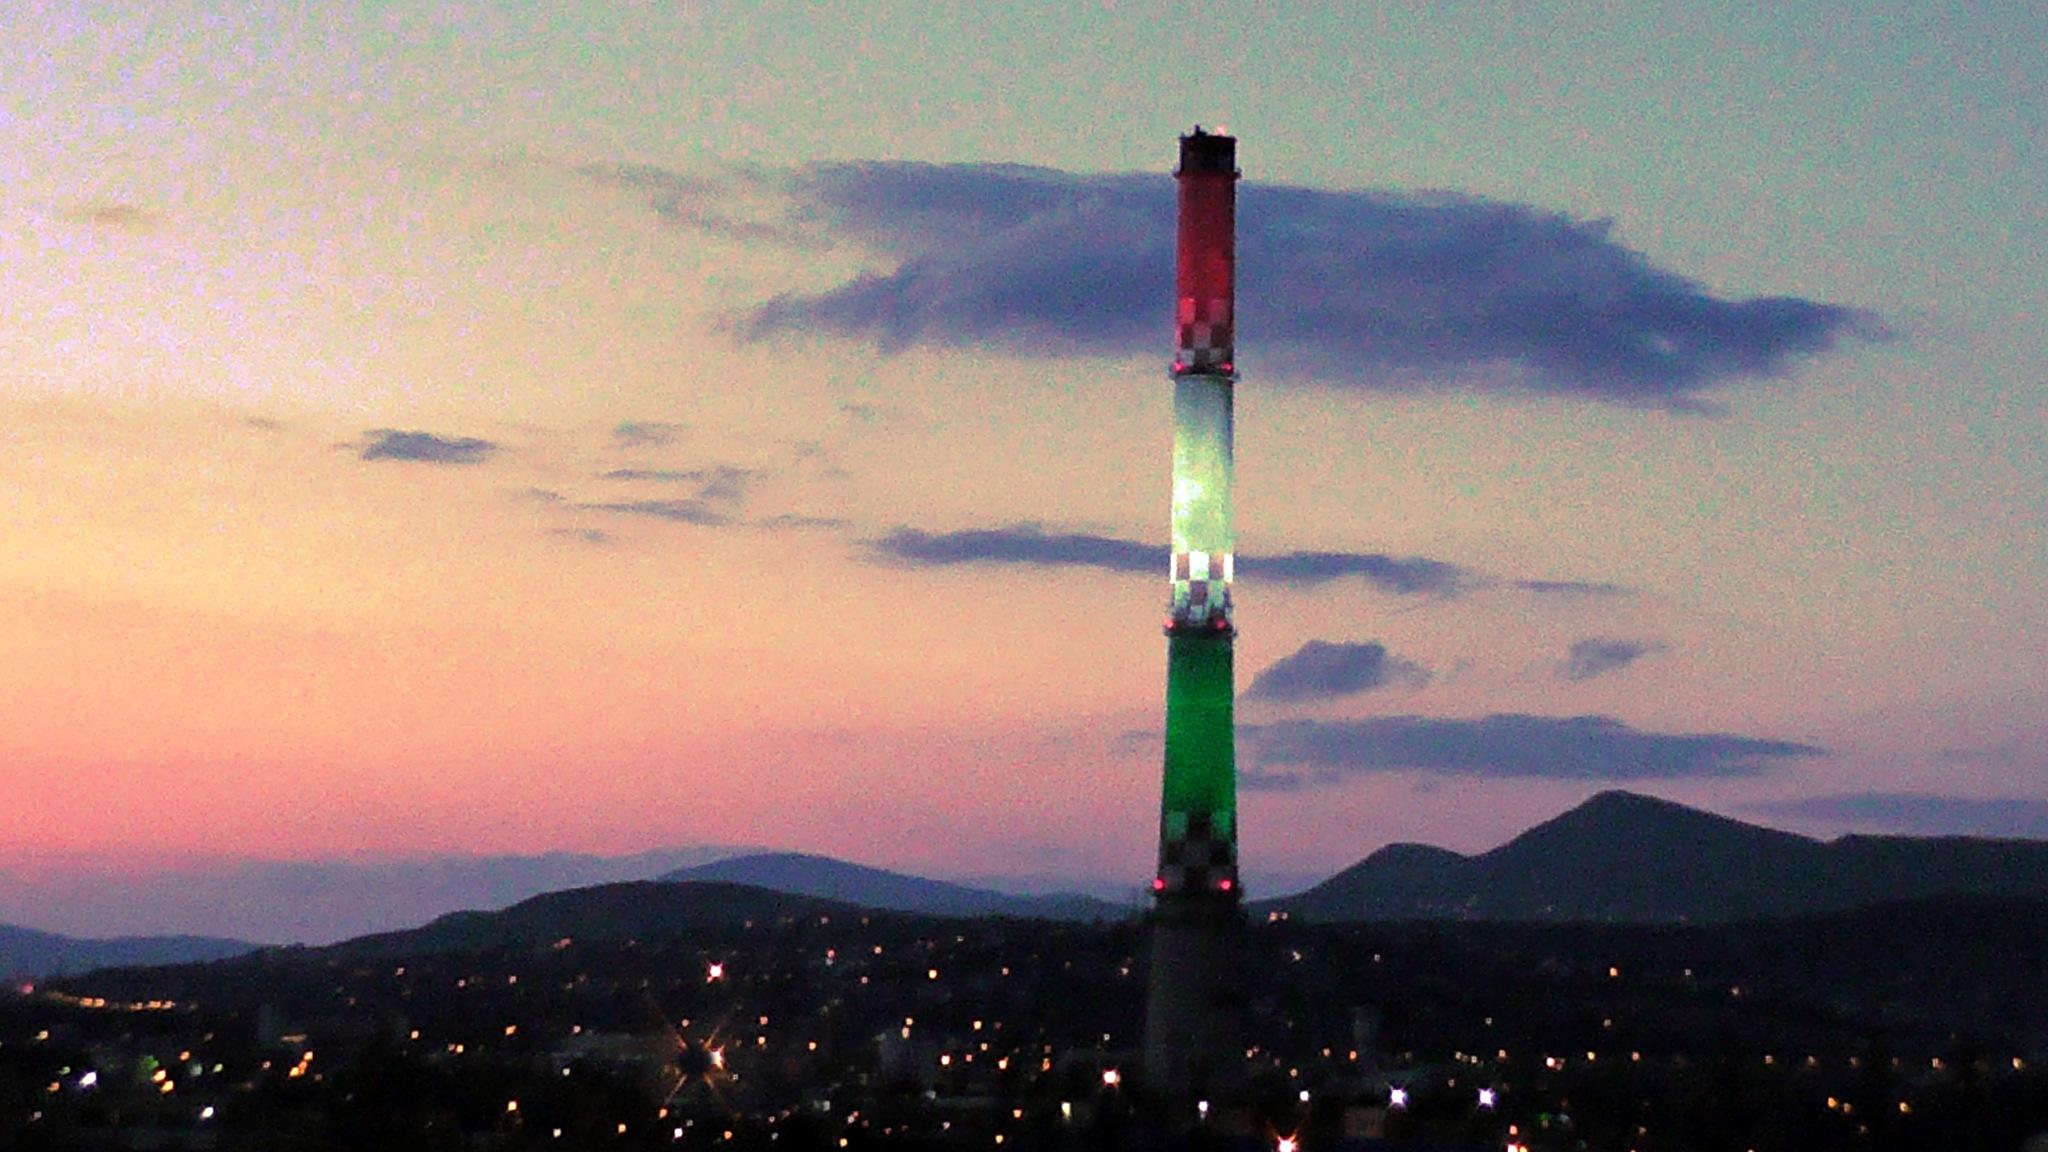 Óbuda / festive illumination by evakalocsay